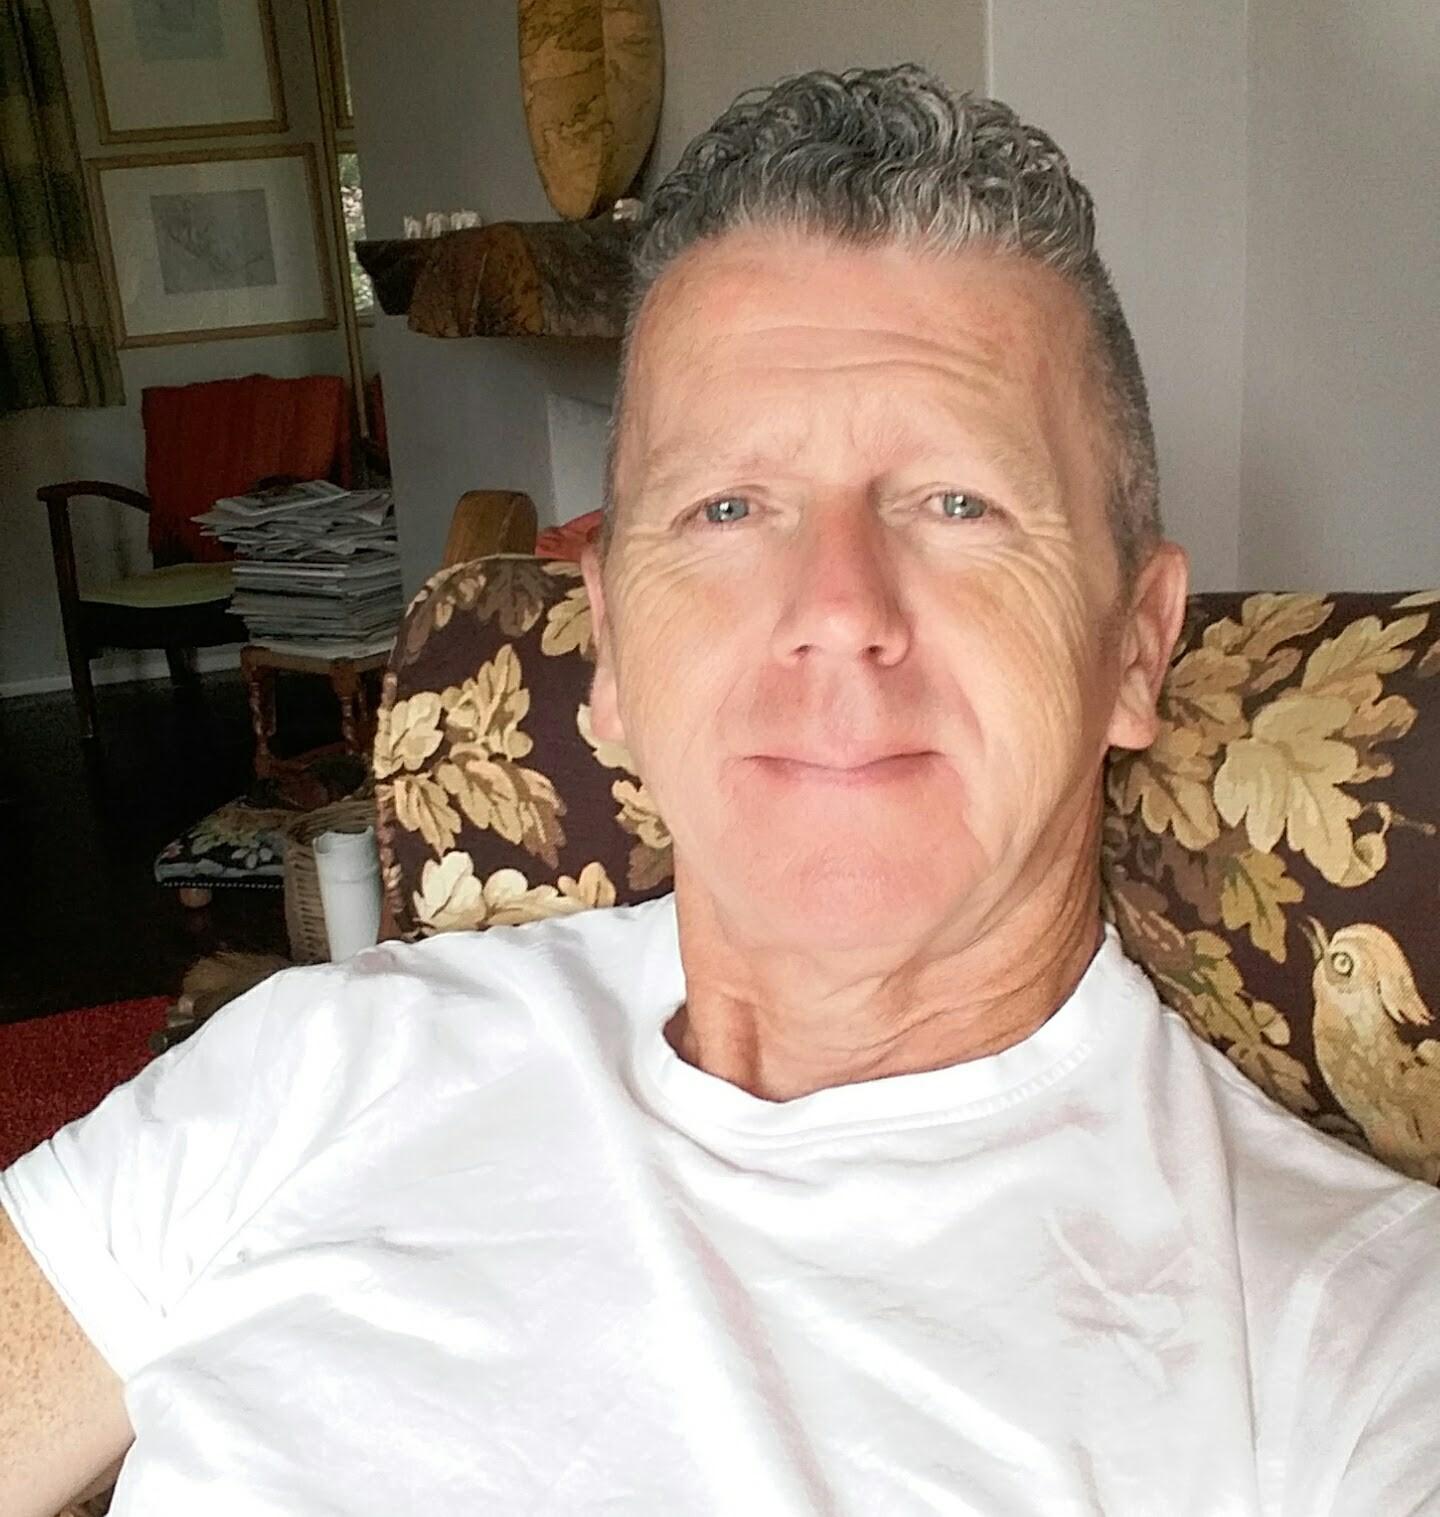 Patrick Hunter